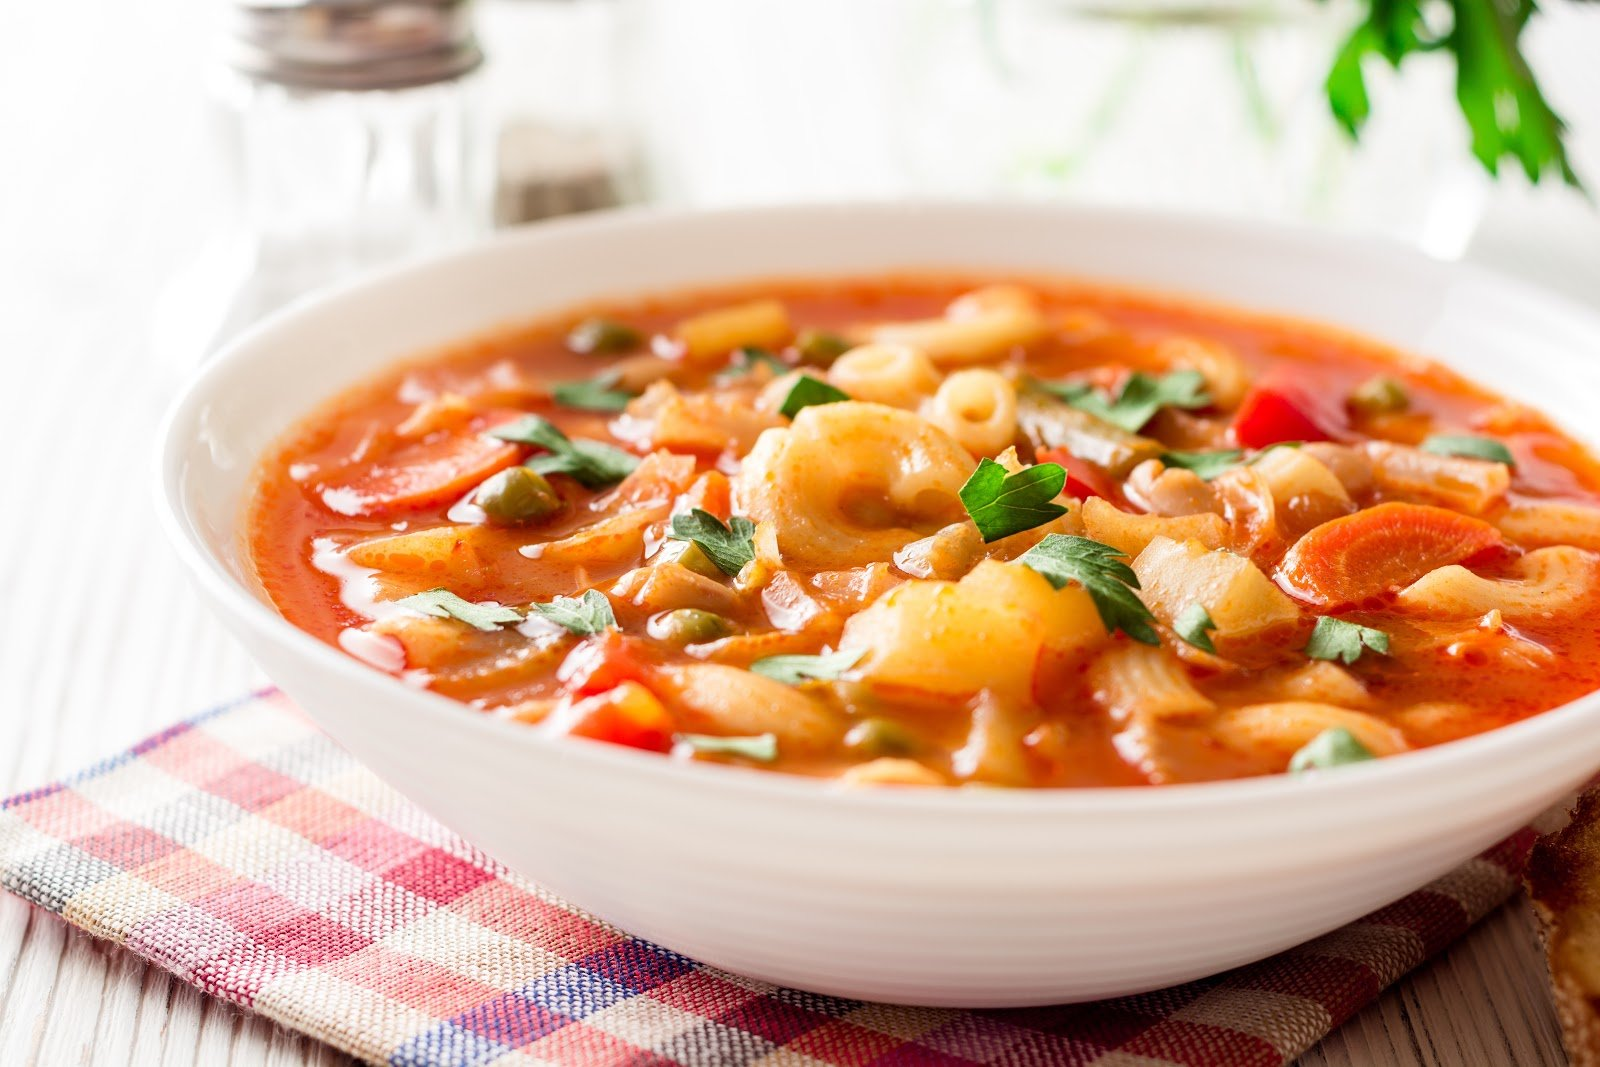 ibs diet: Italian minestrone soup in a bowl